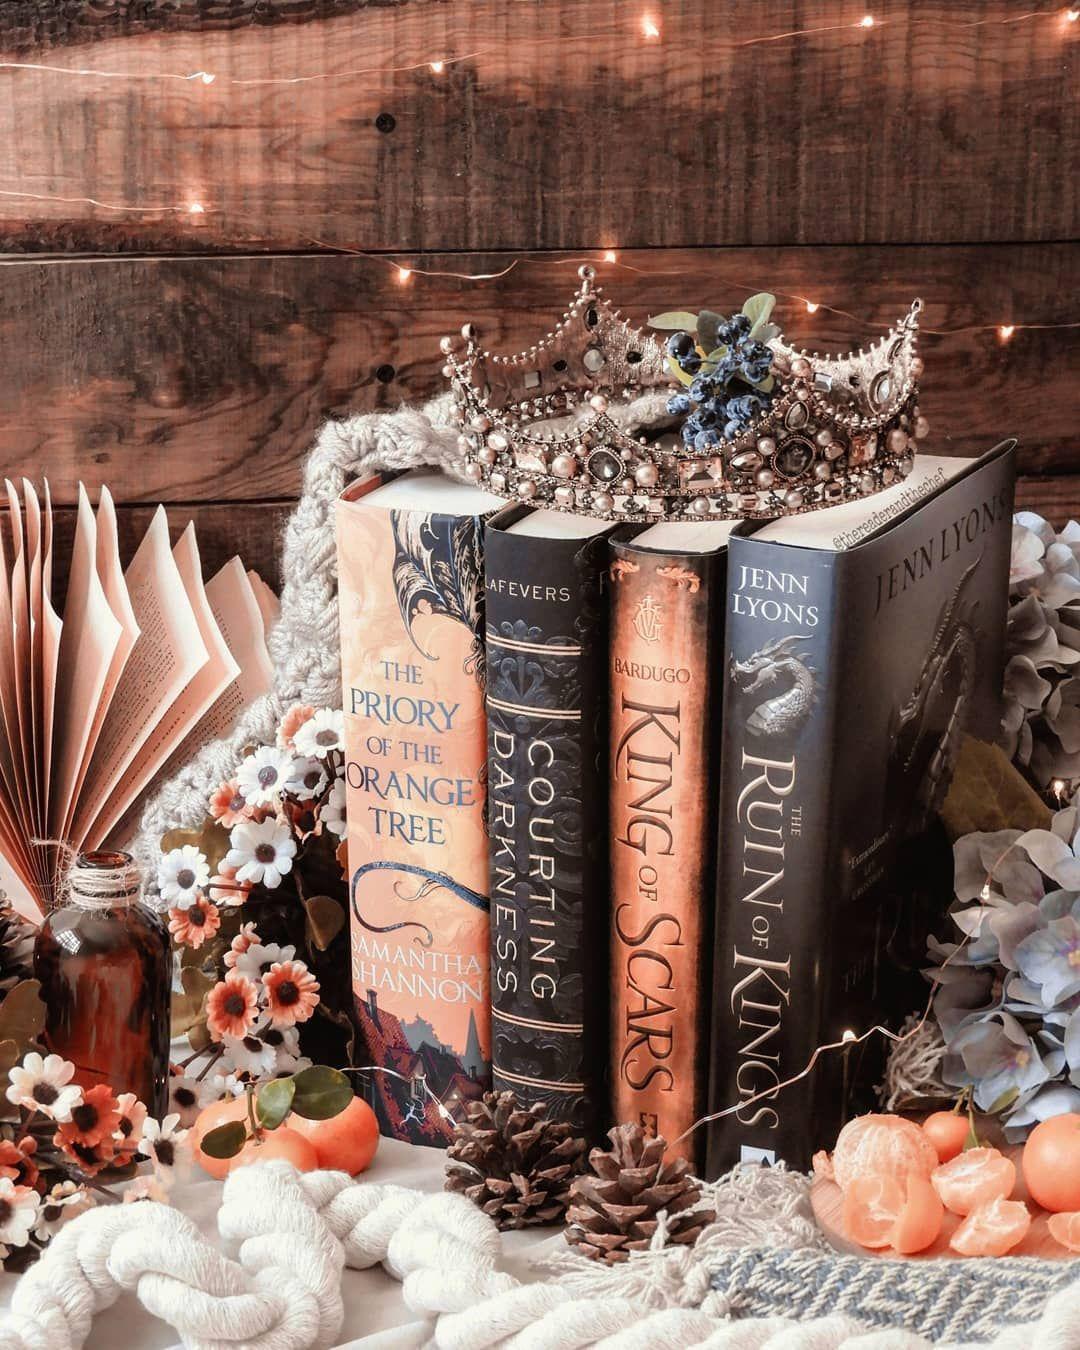 Amazing Ya Fantasy Books Bookstagram Reading Books Yalit Literature Fantasybooks Dragonbooks Kingof Ya Fantasy Books Fantasy Books Book Photography